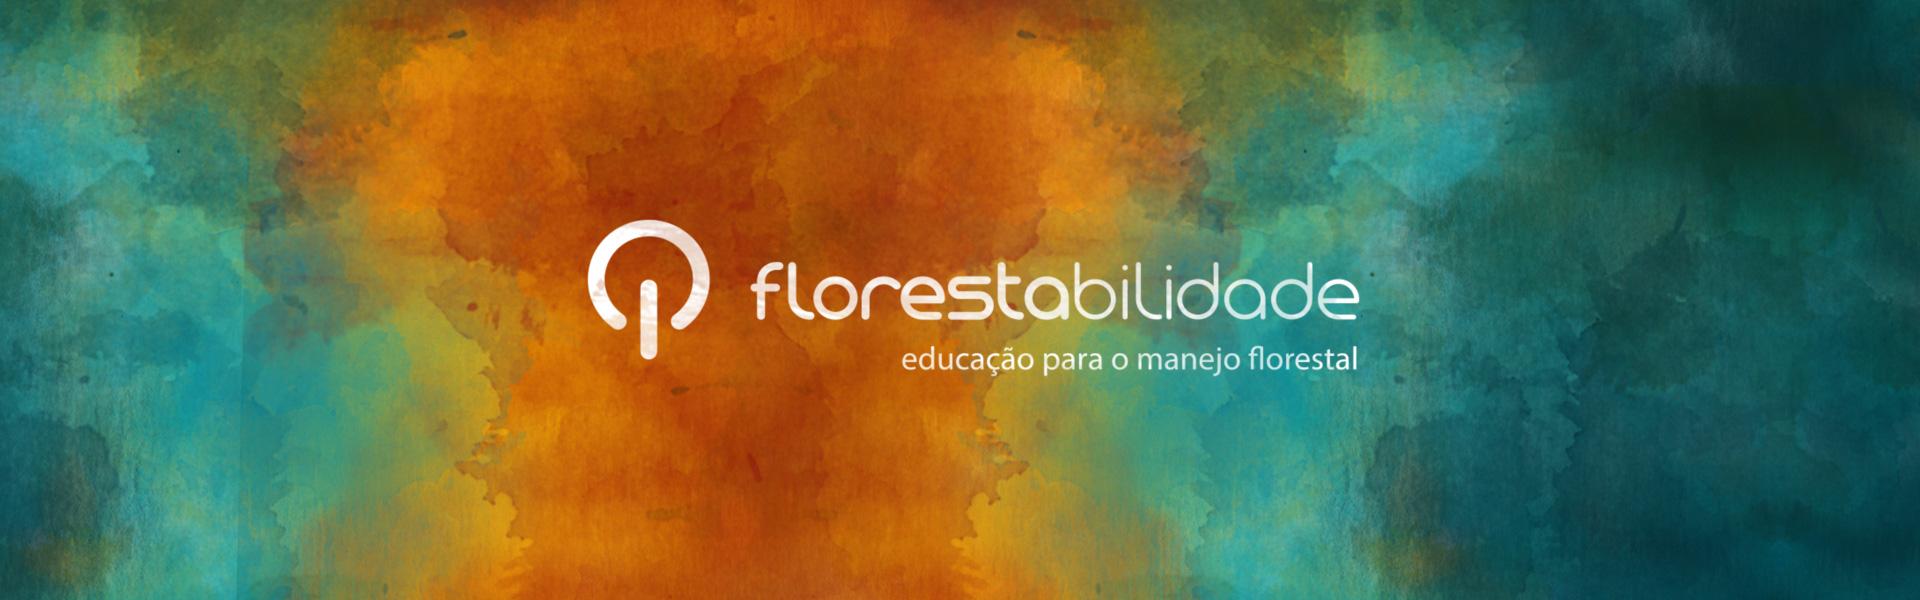 Florestabilidade